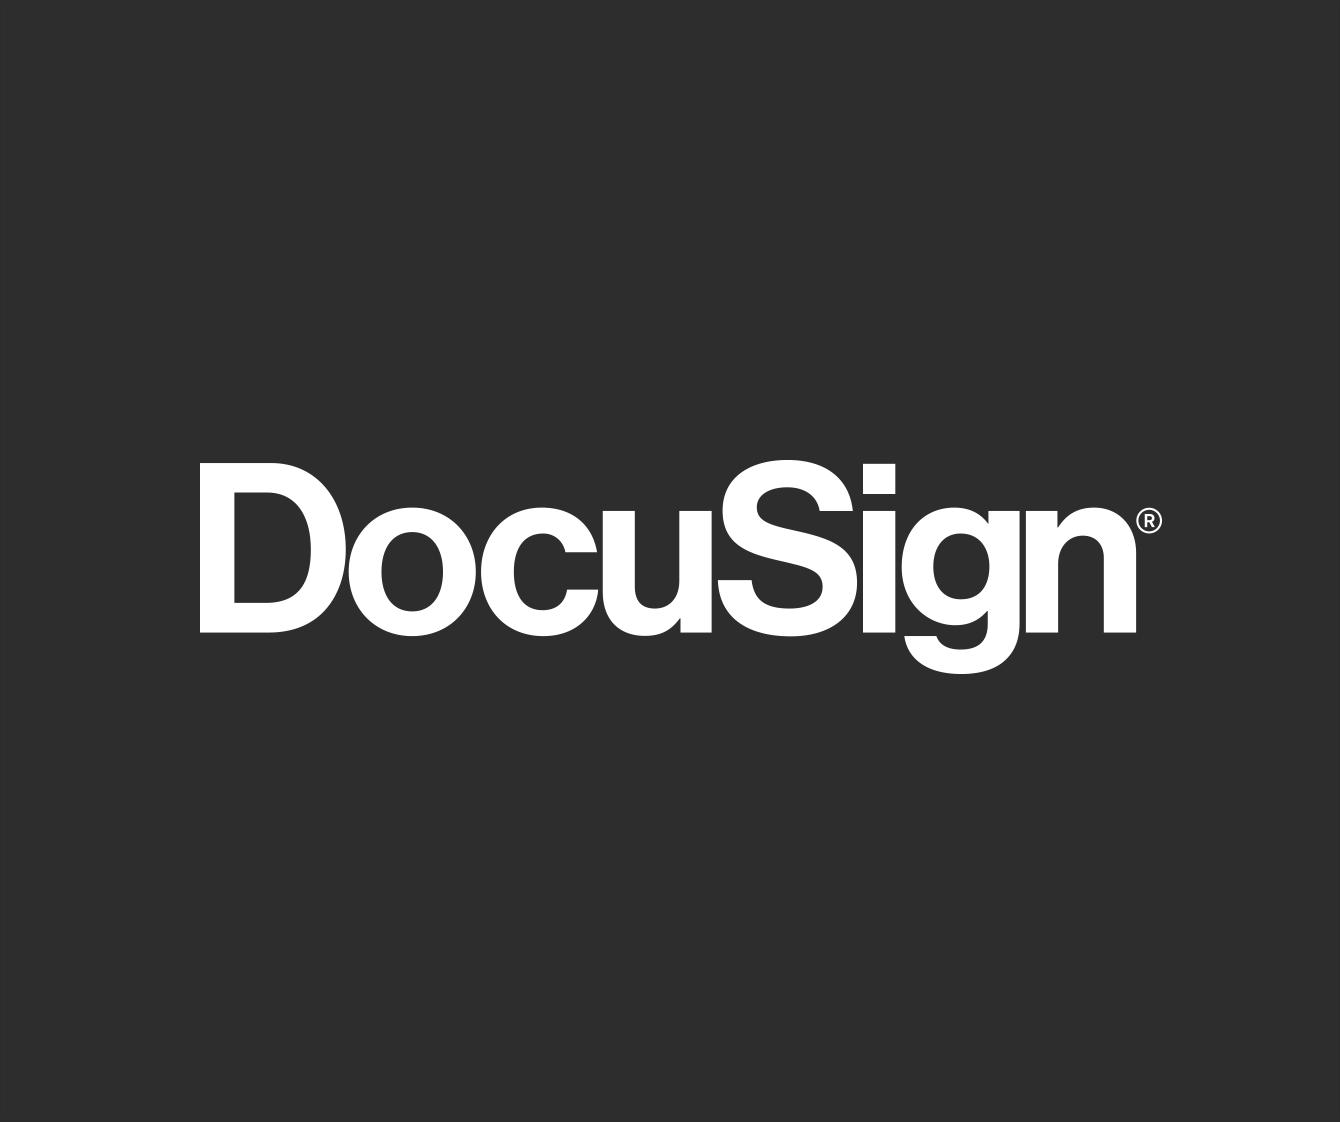 Docusign_Dev5_2x.png